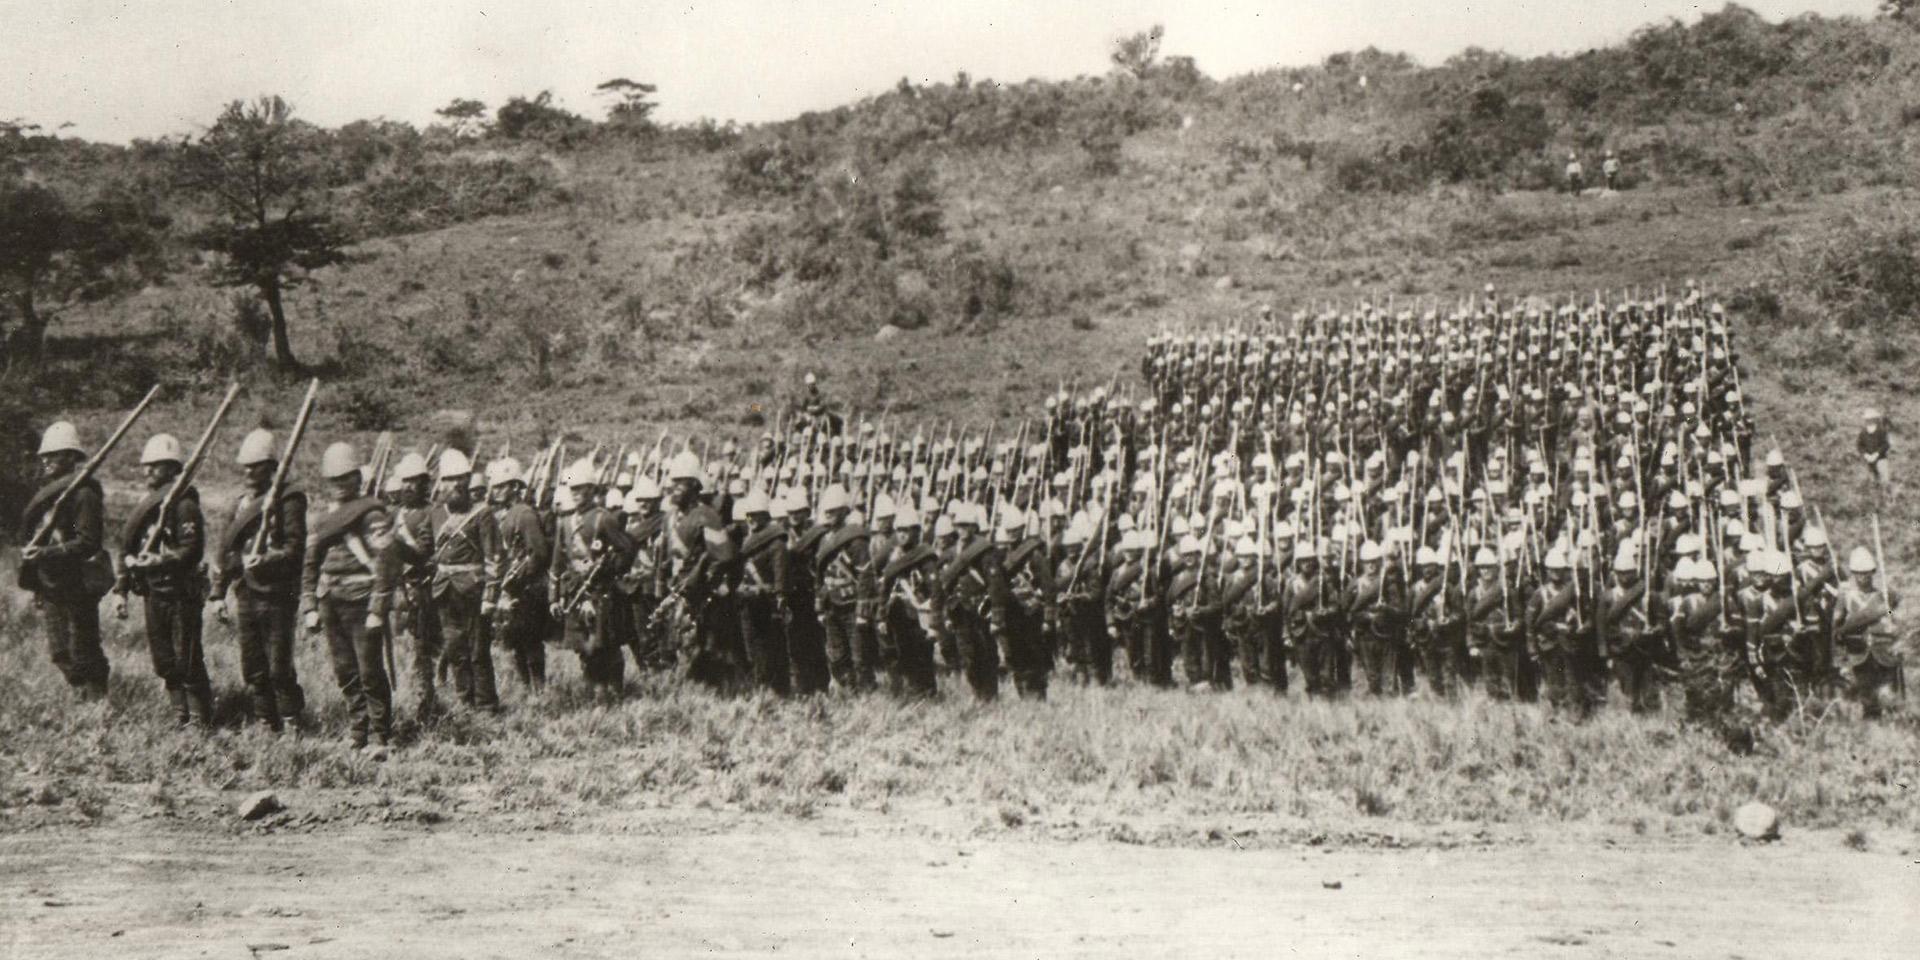 91st Highlanders in Zululand 1879.